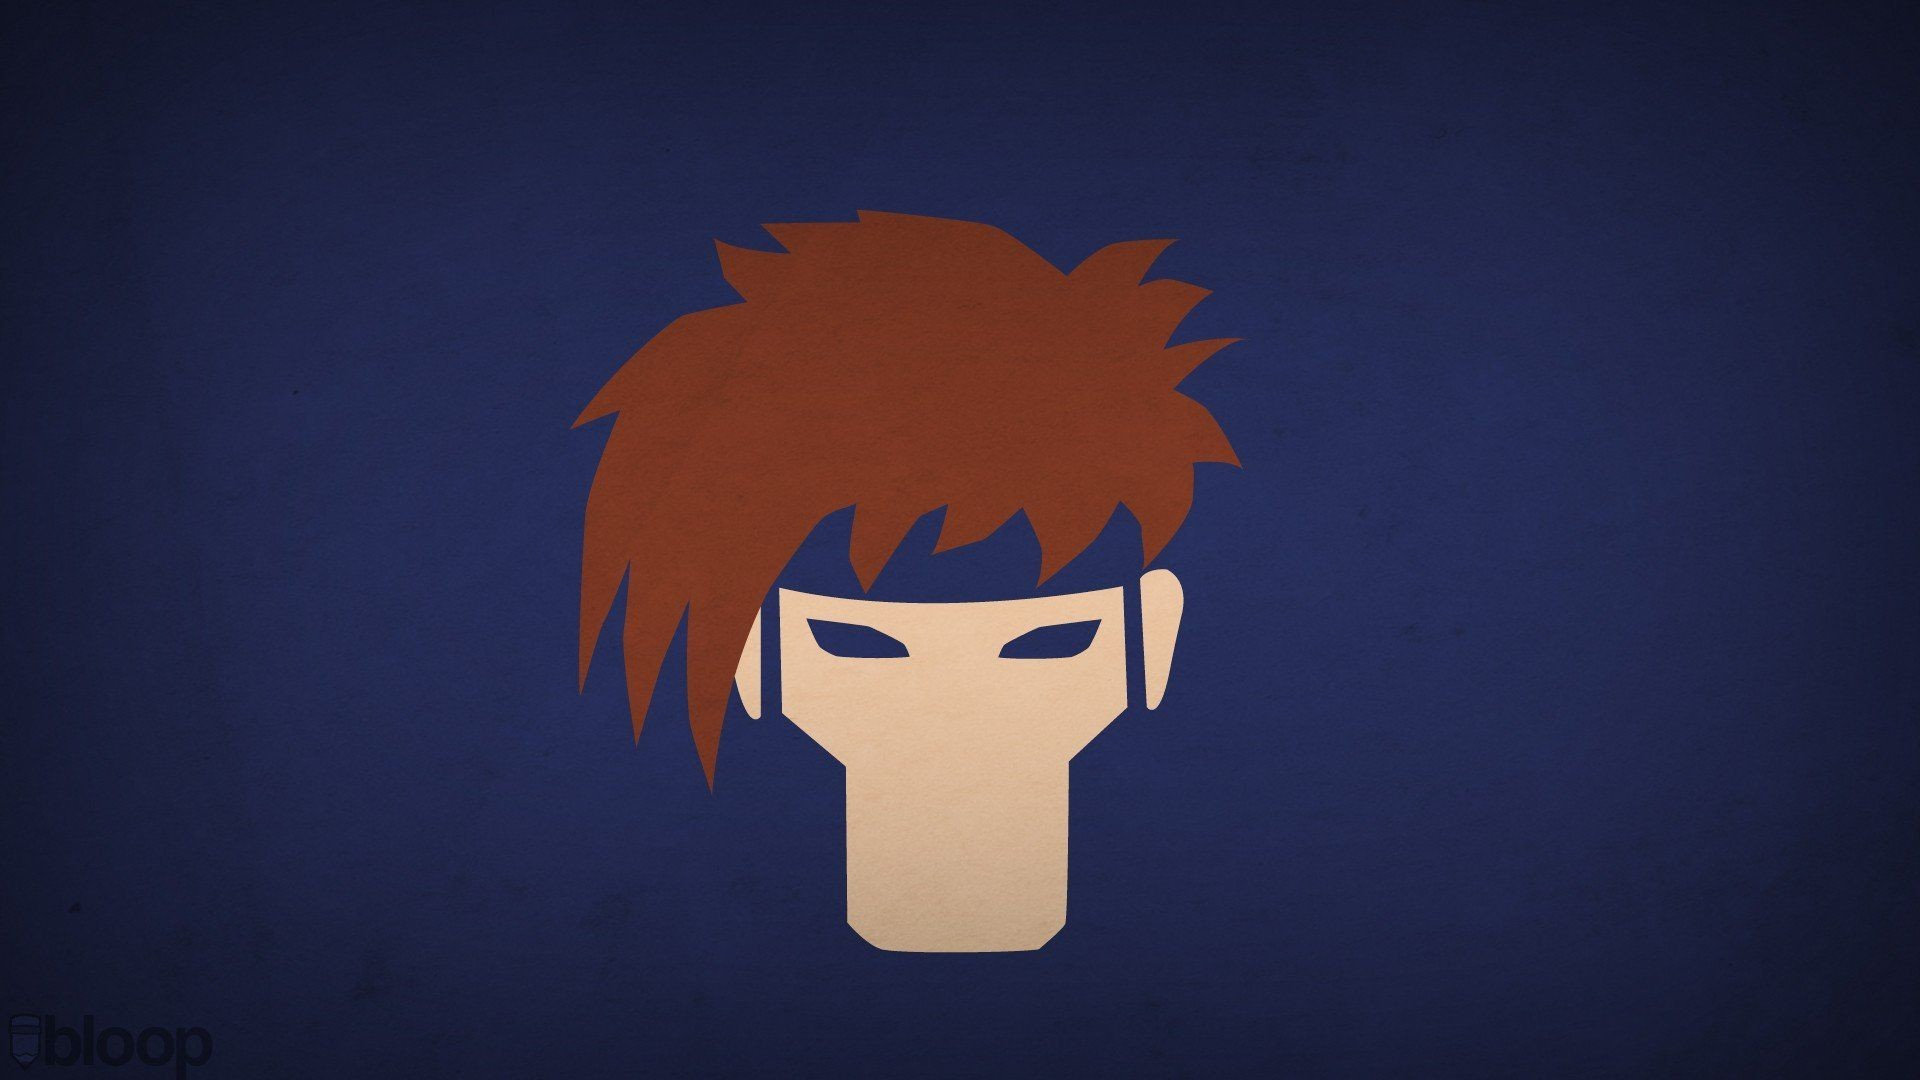 Res: 1920x1080, minimalist superhero wallpapers - Google Search | super hero | Pinterest |  Superhero